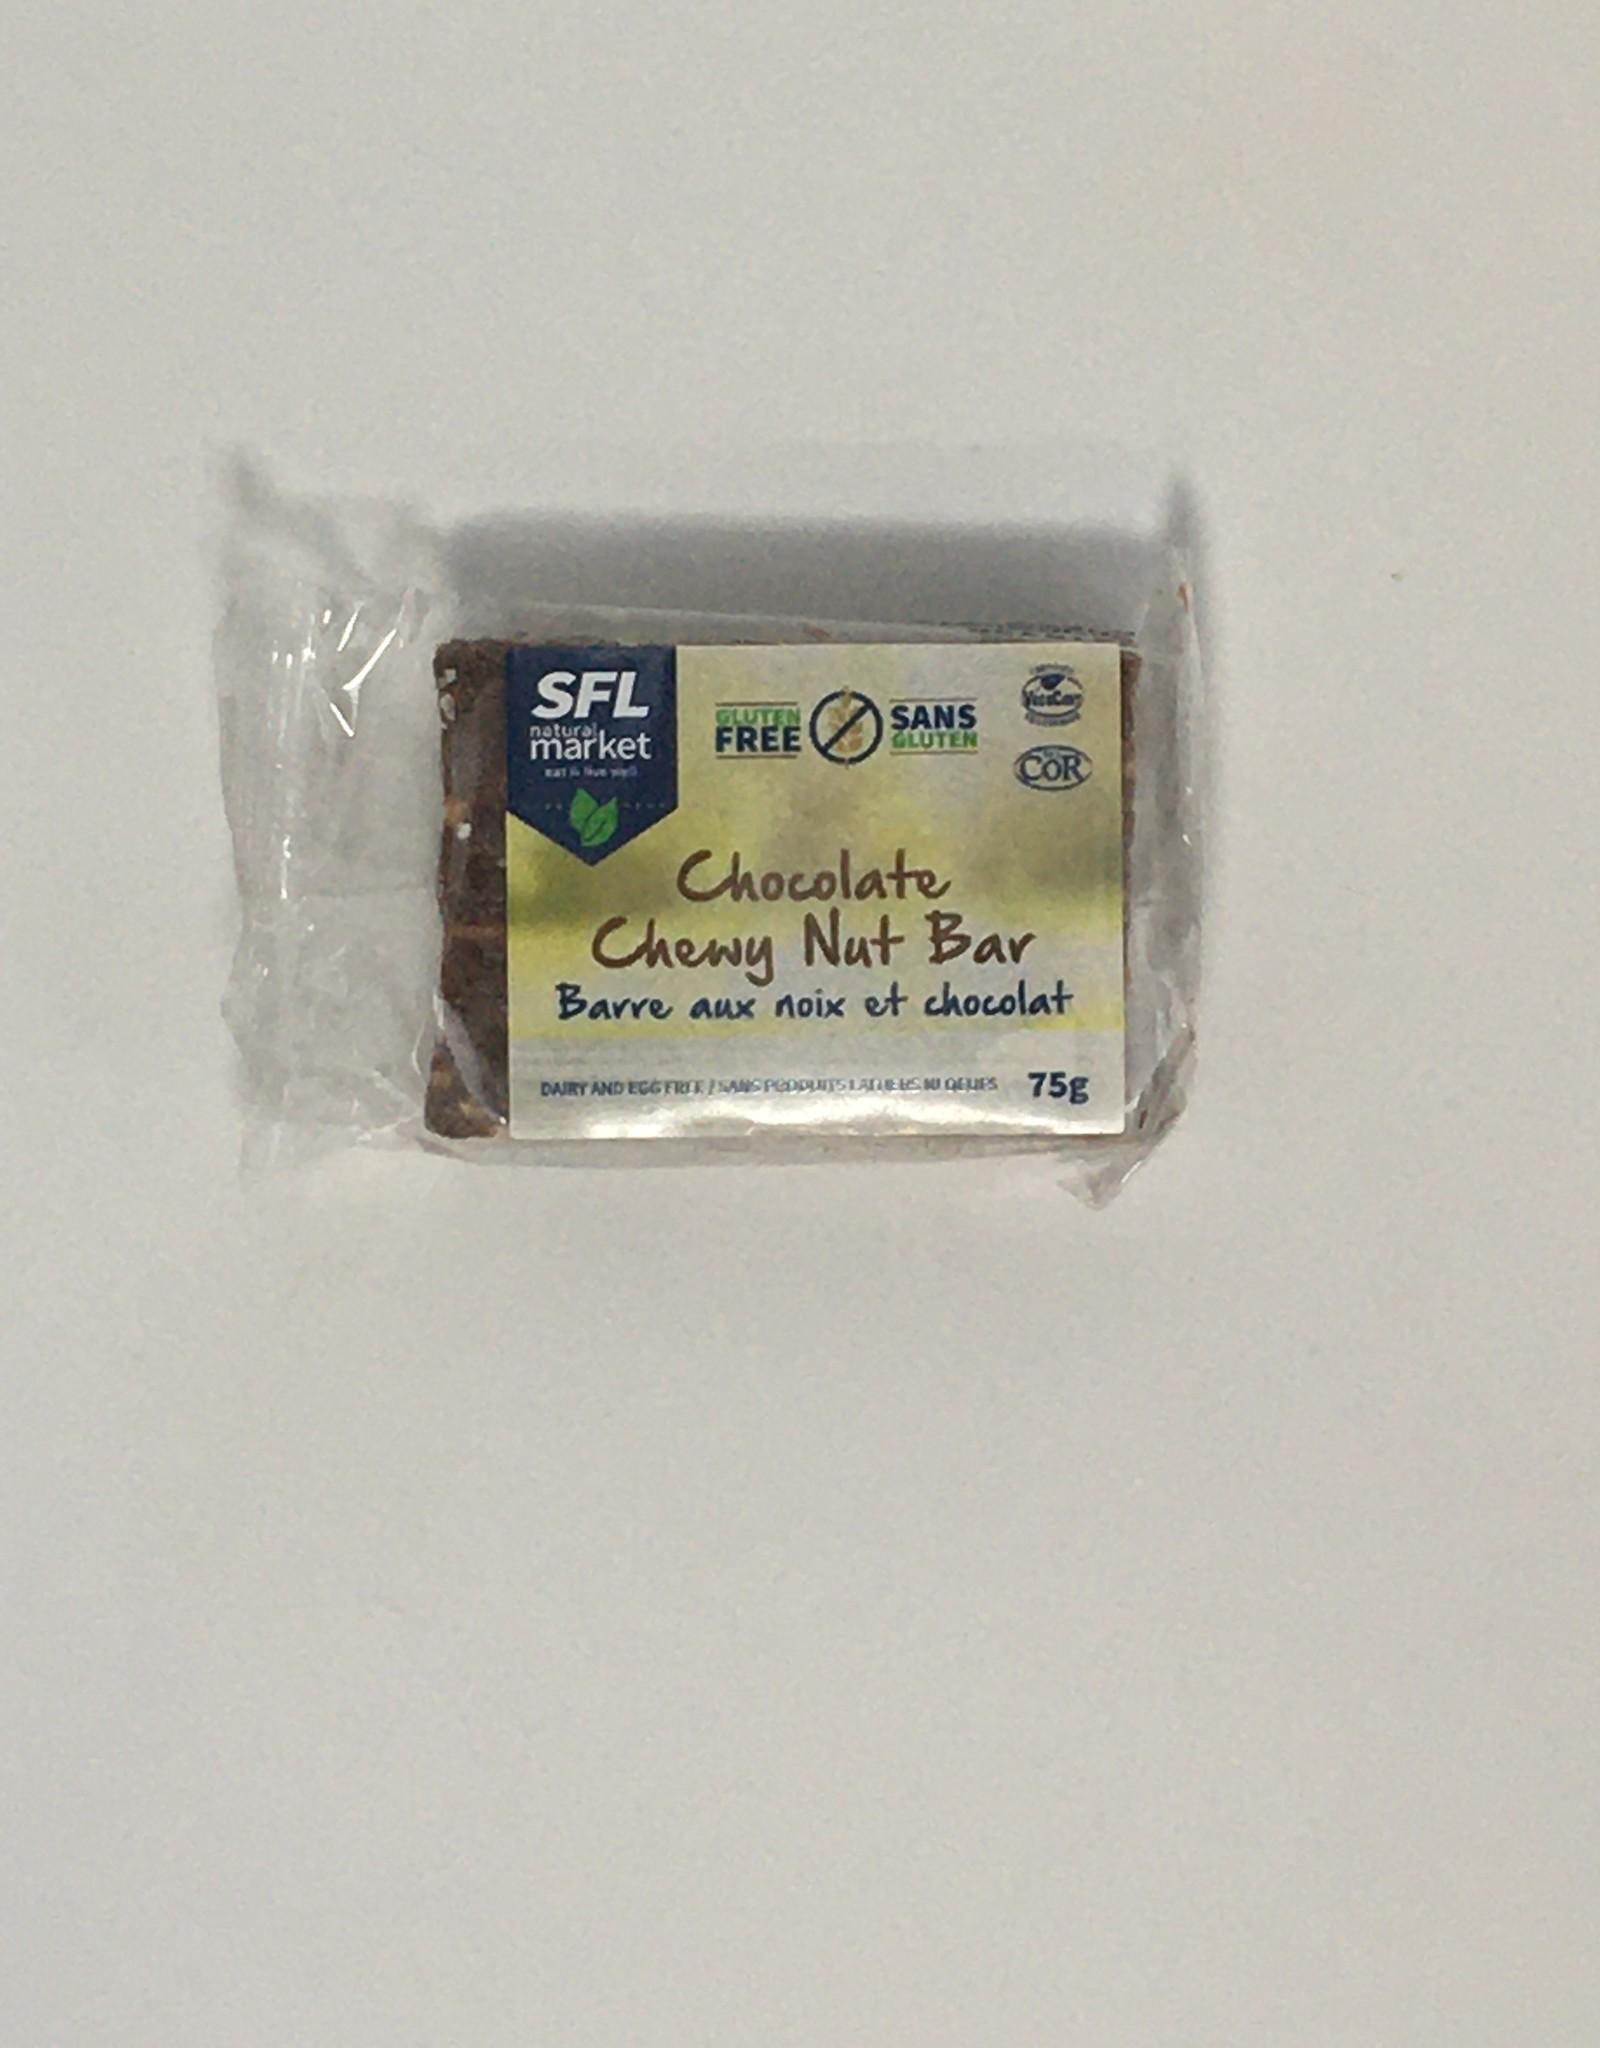 Sweets From The Earth Sweets From The Earth - SFL Chocolate Chewy Nut Bar